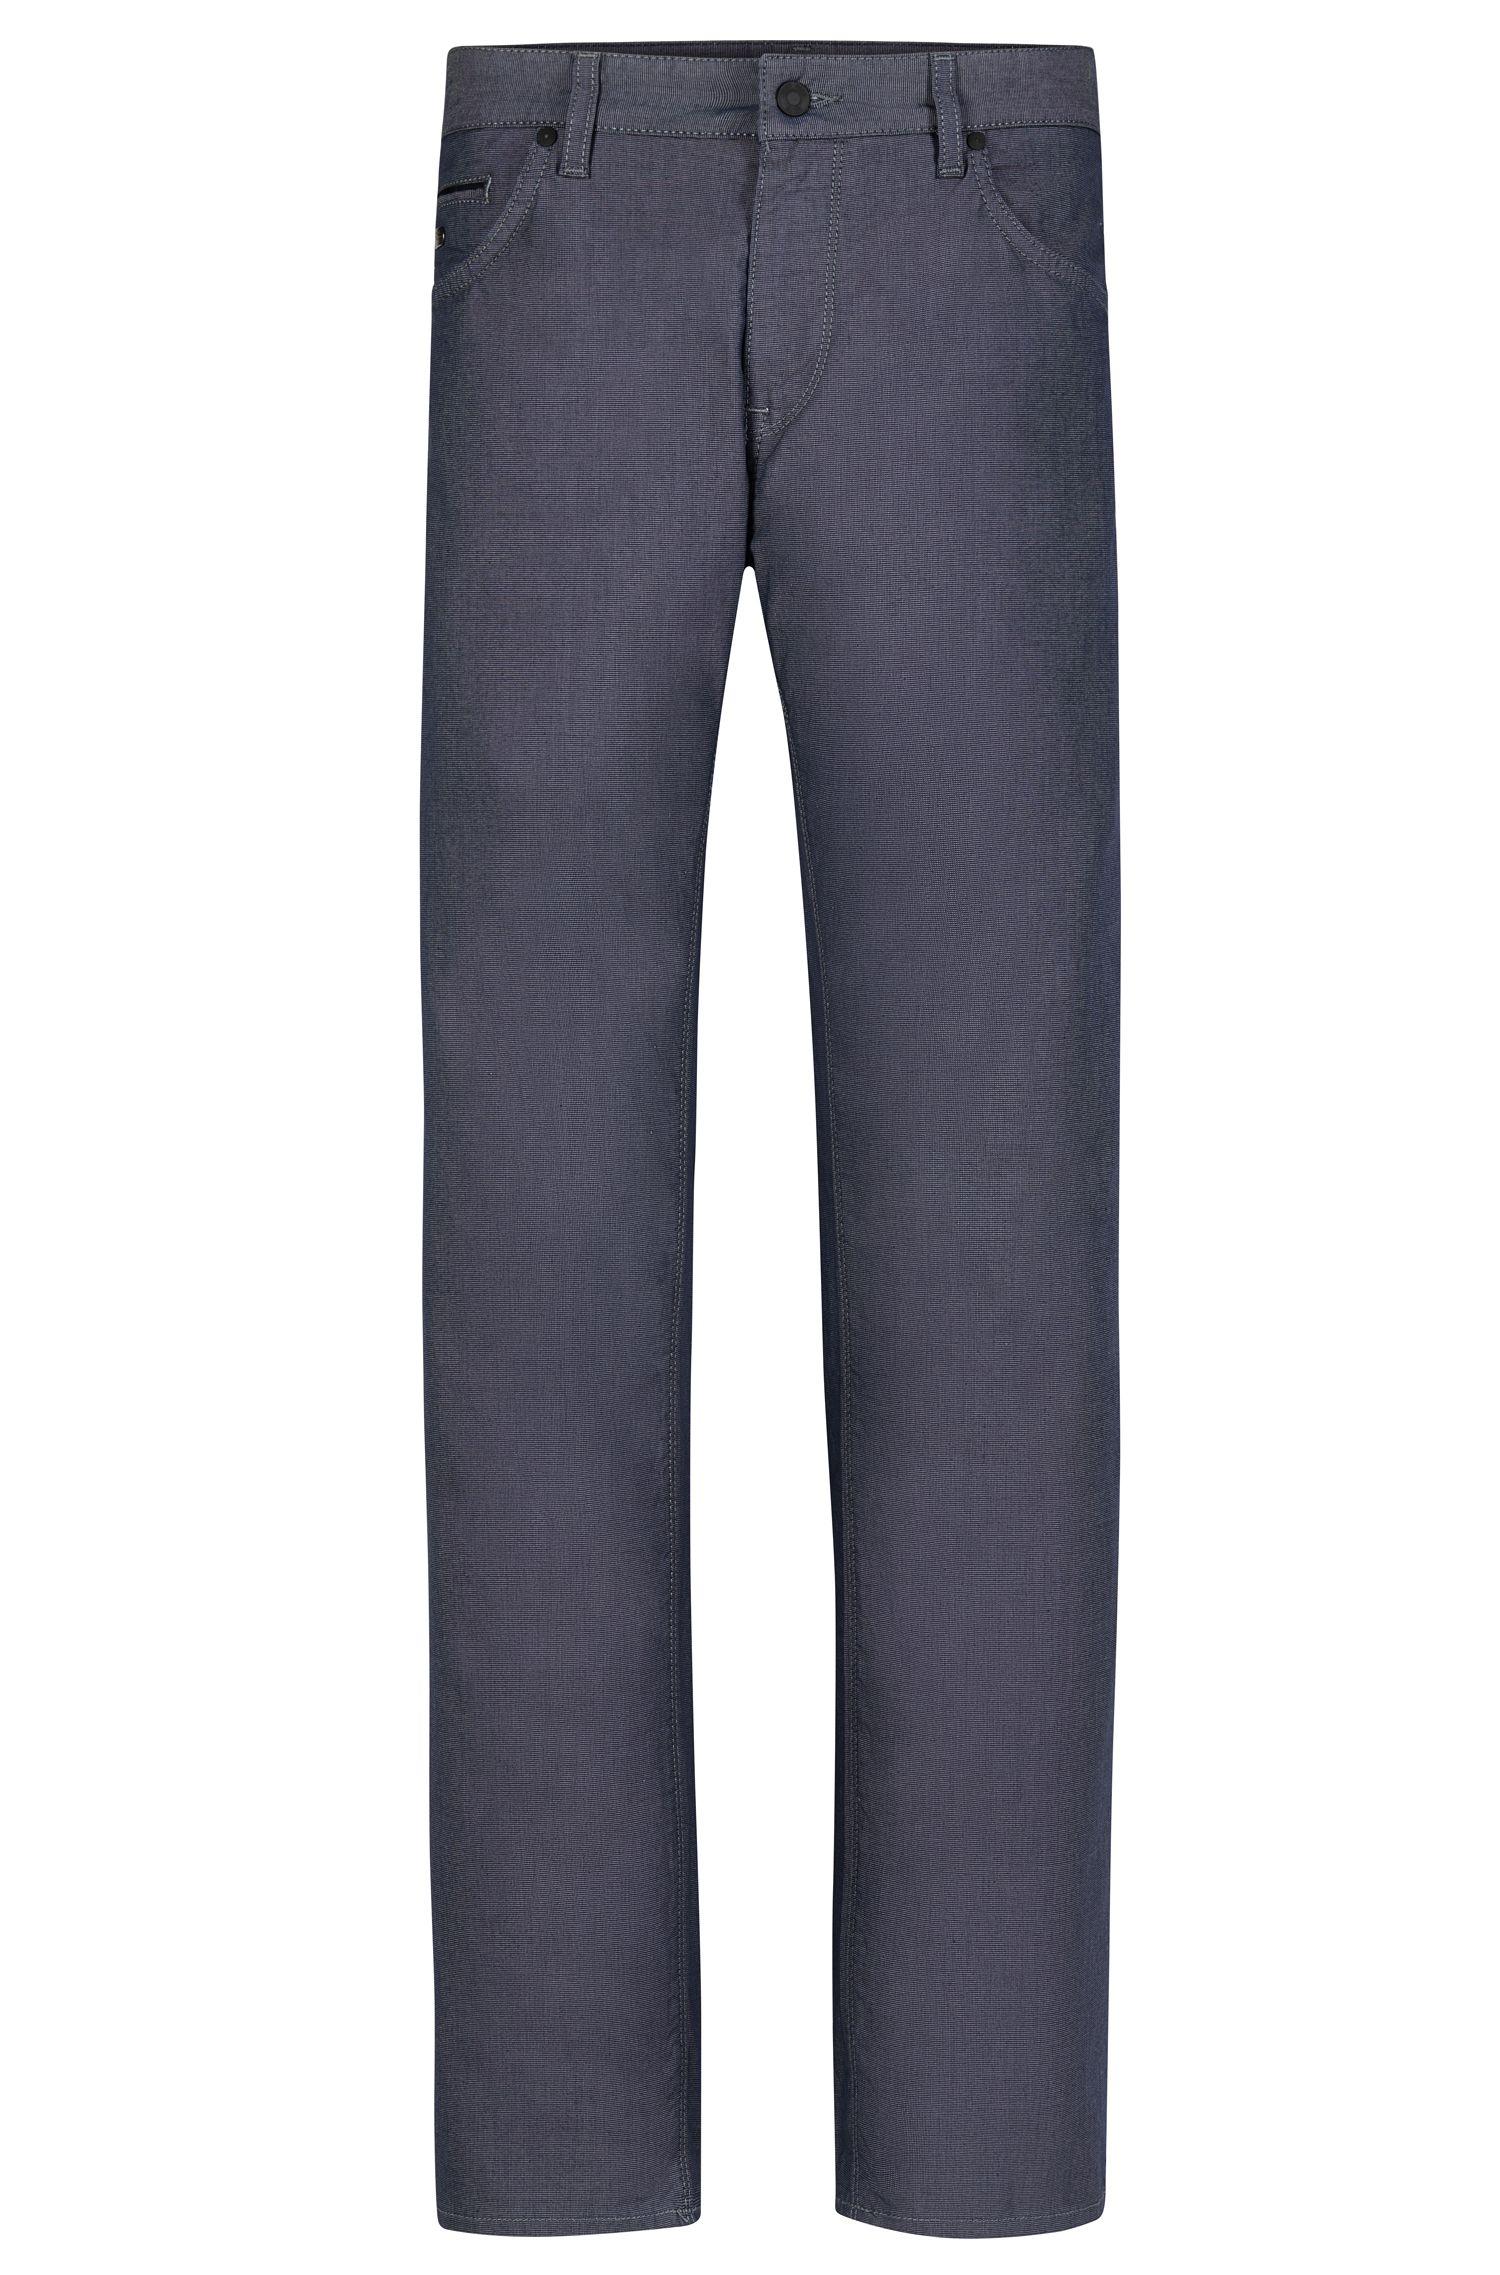 'C Maine'   Regular Fit, 10 oz Stretch Cotton Blend Jeans